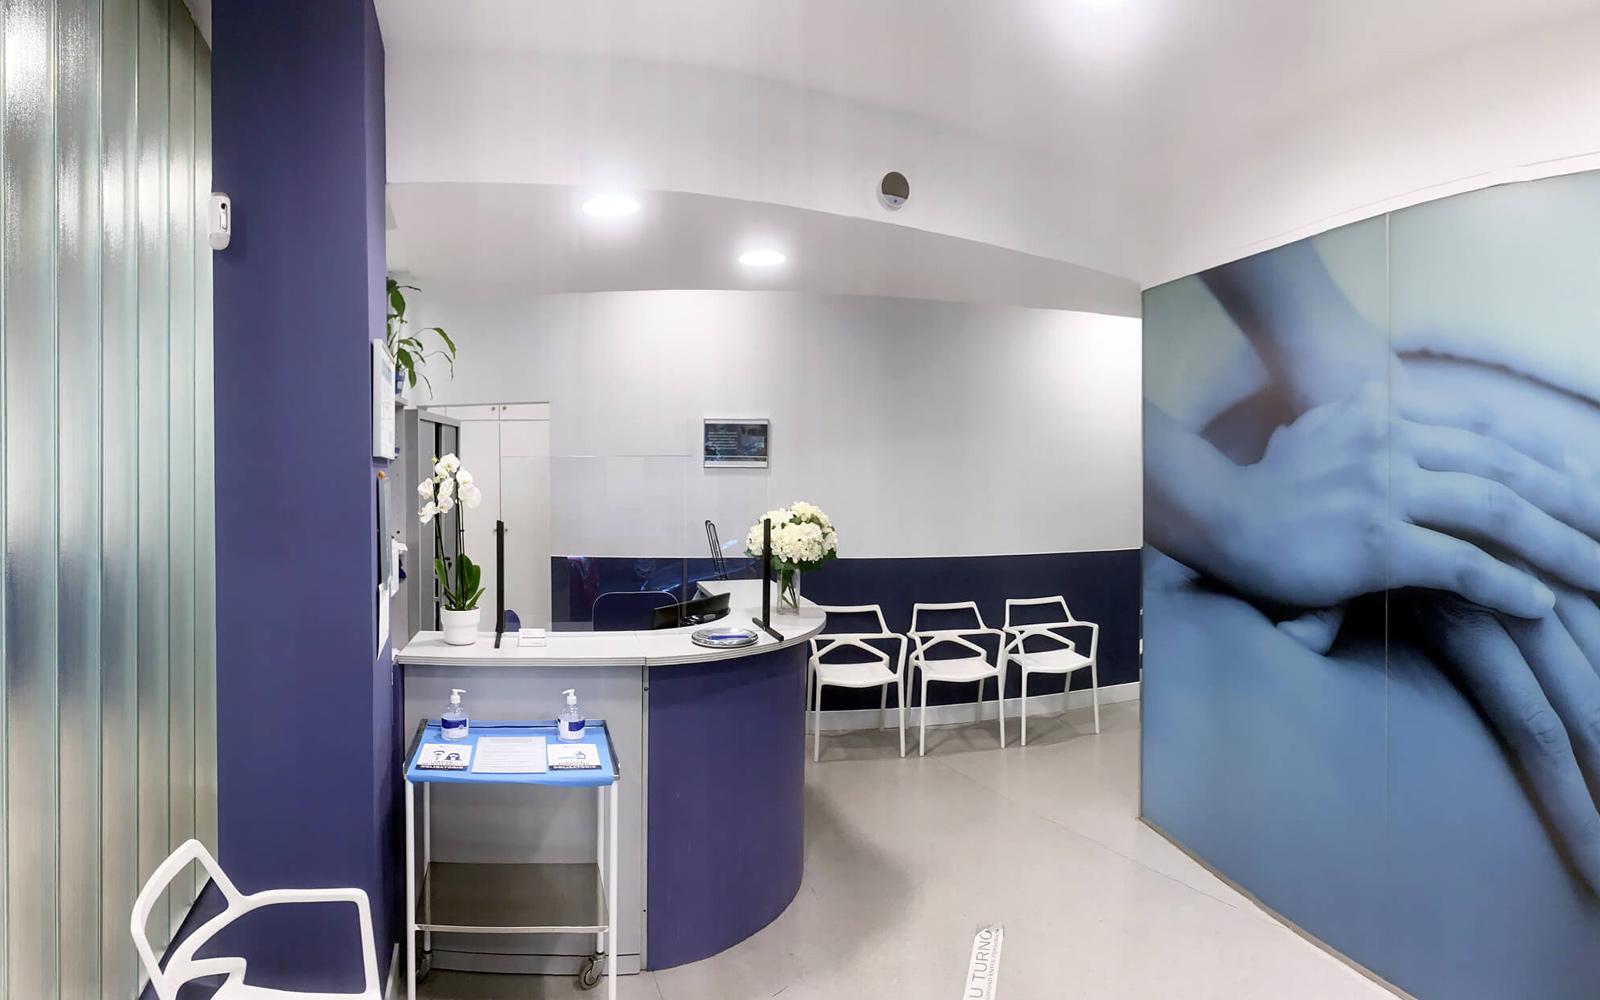 Fisioterapia y rehabilitación en Bilbao (Barraincúa)